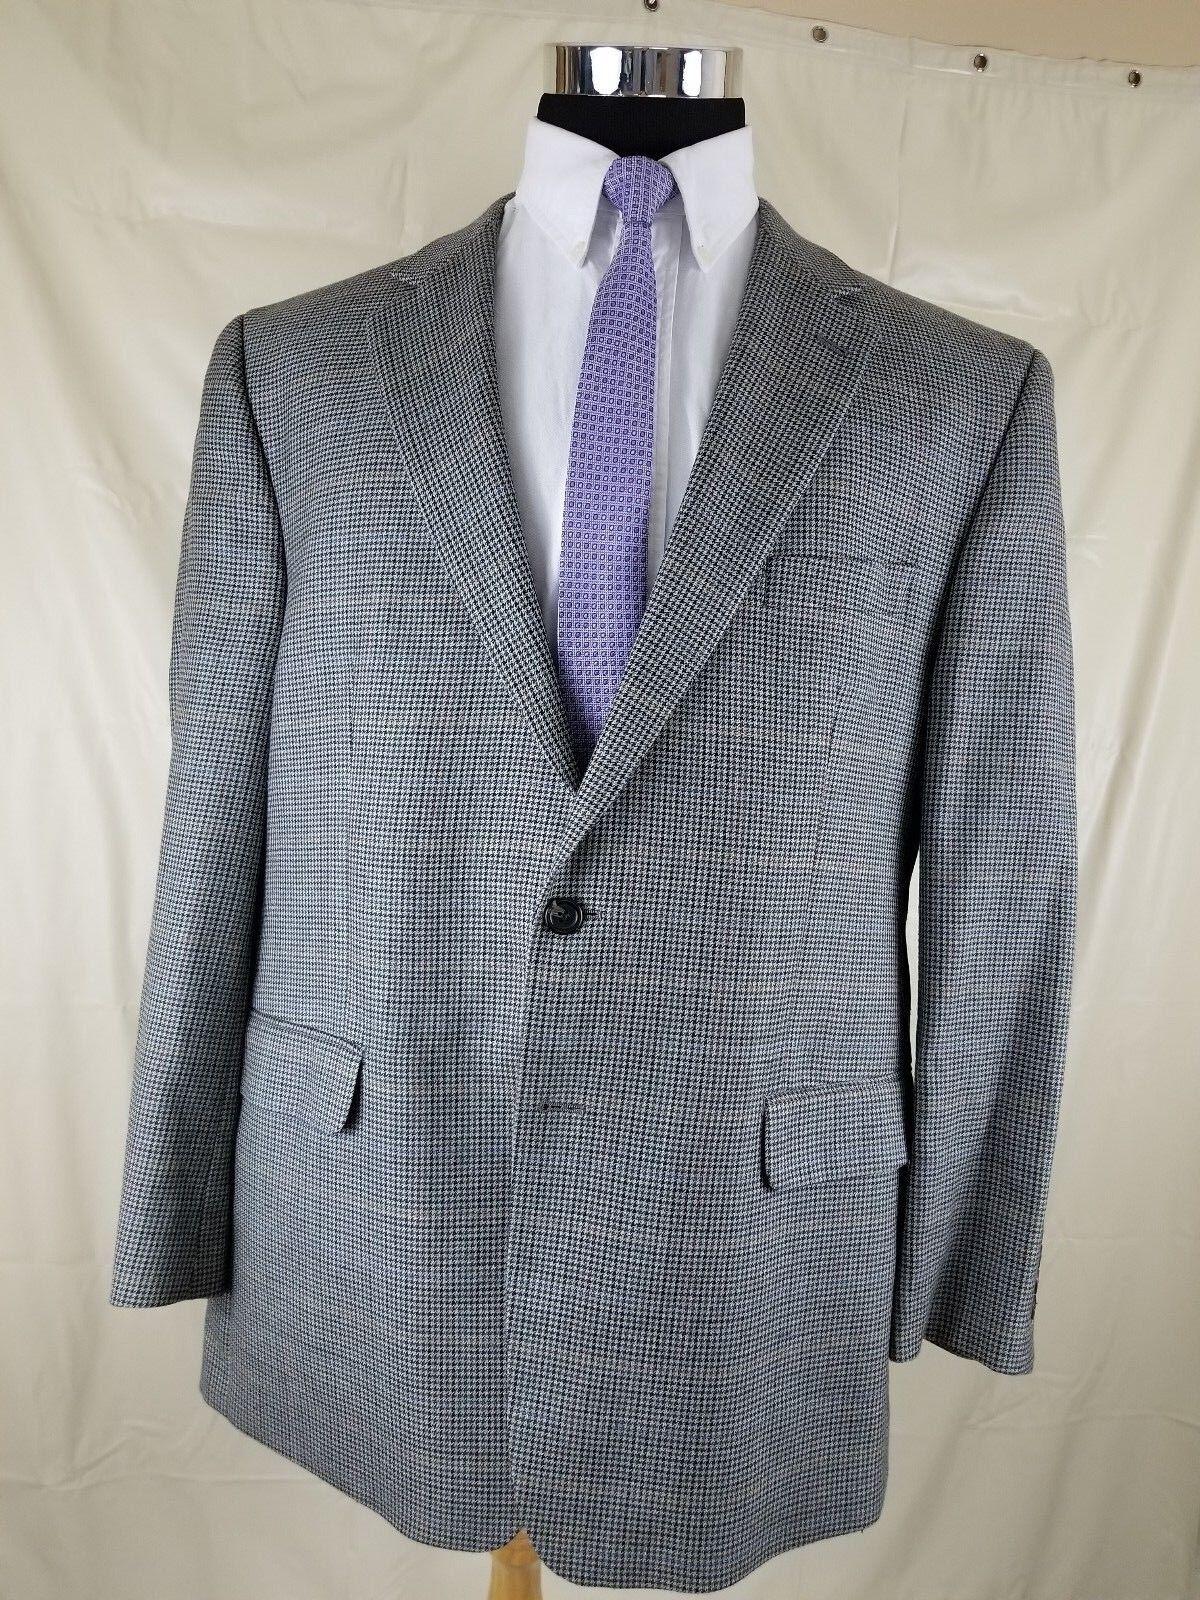 Chaps Ralph Lauren  Herren Sport Coat Houndstooth 2 Button Silk-Wool grau 46 R